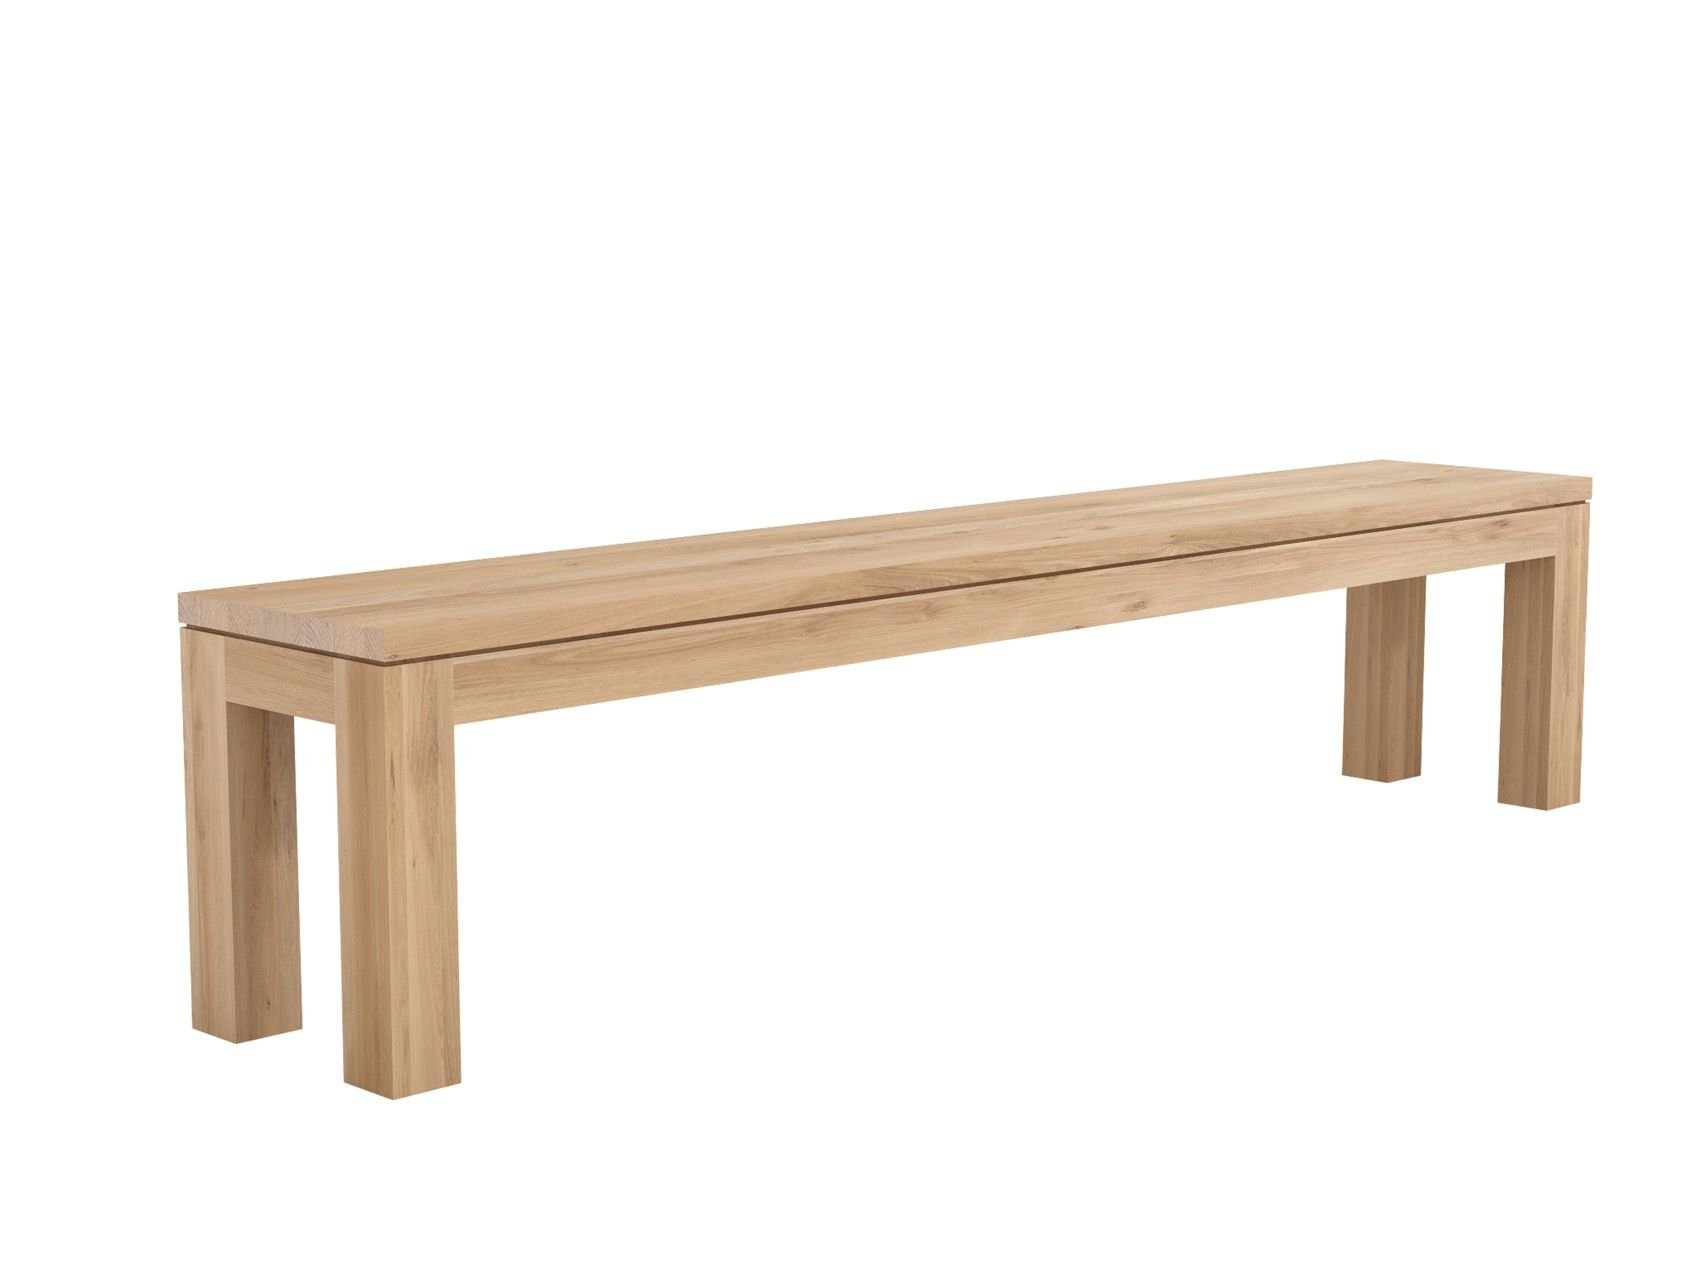 Ethnicraft Straight Bench